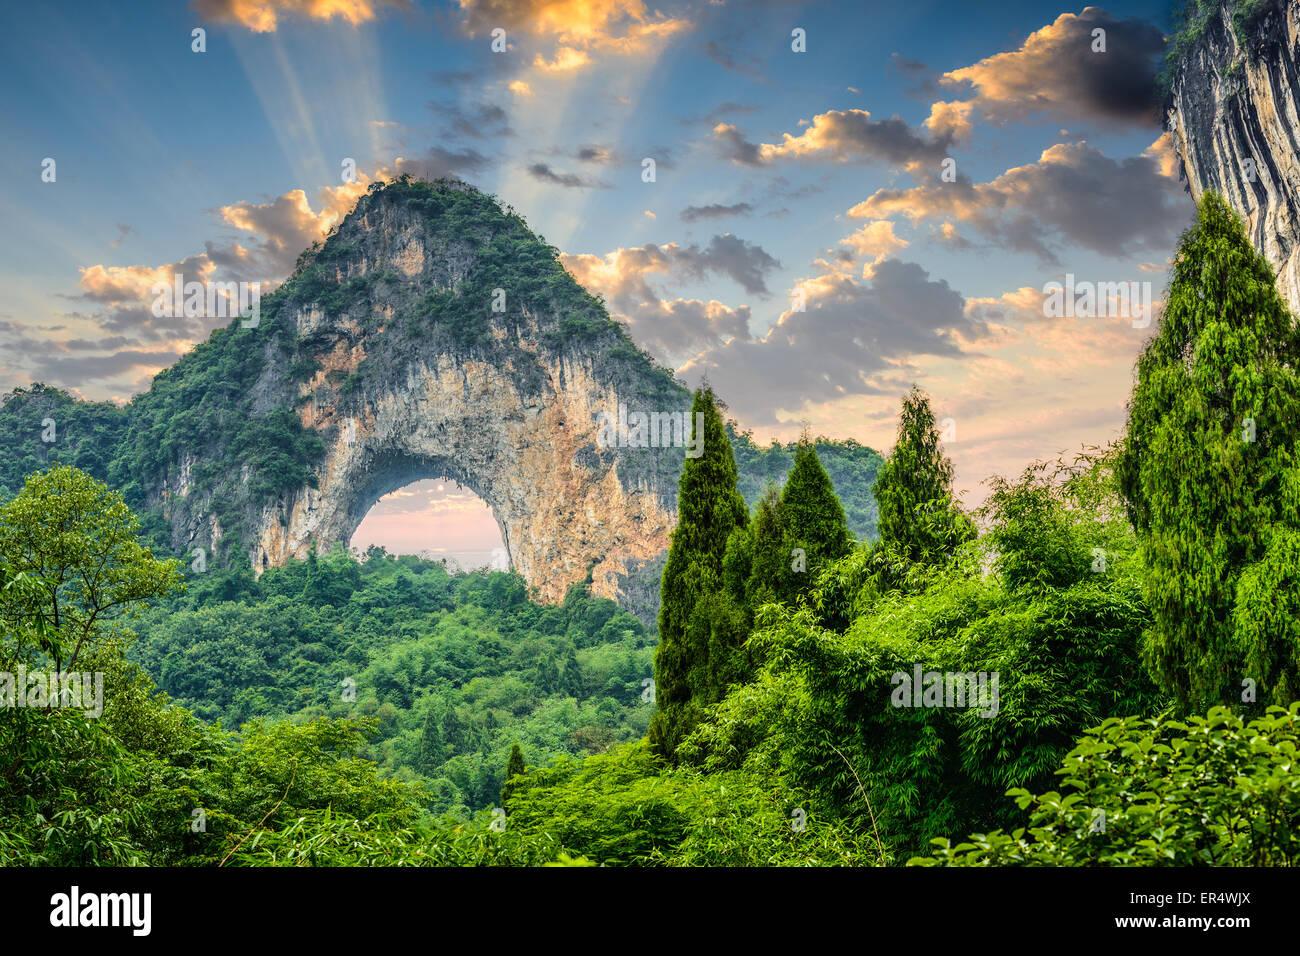 Moon Hill, Yangshuo, China. - Stock Image